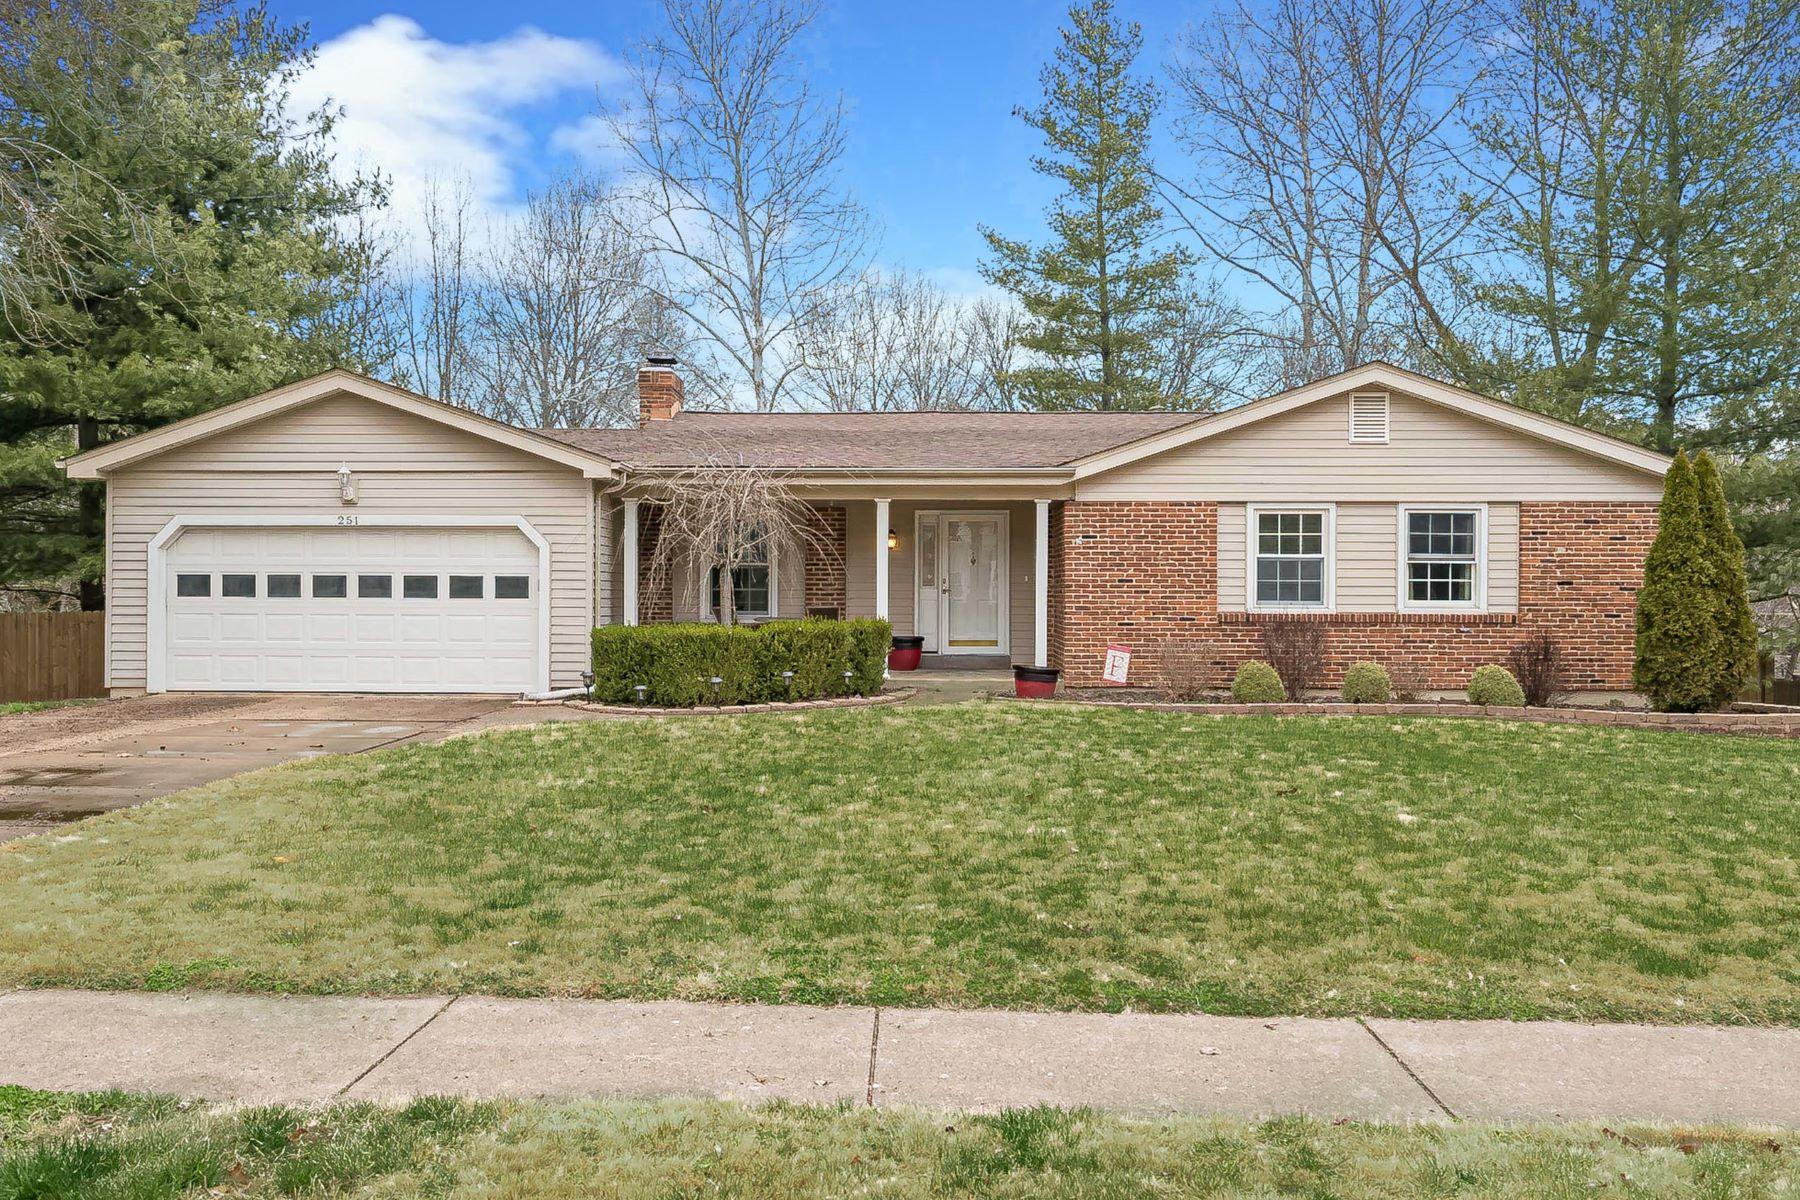 Single Family Homes für Verkauf beim Impressively Perfect Ballwin Ranch 251 Treasure Cove, Ballwin, Missouri 63021 Vereinigte Staaten